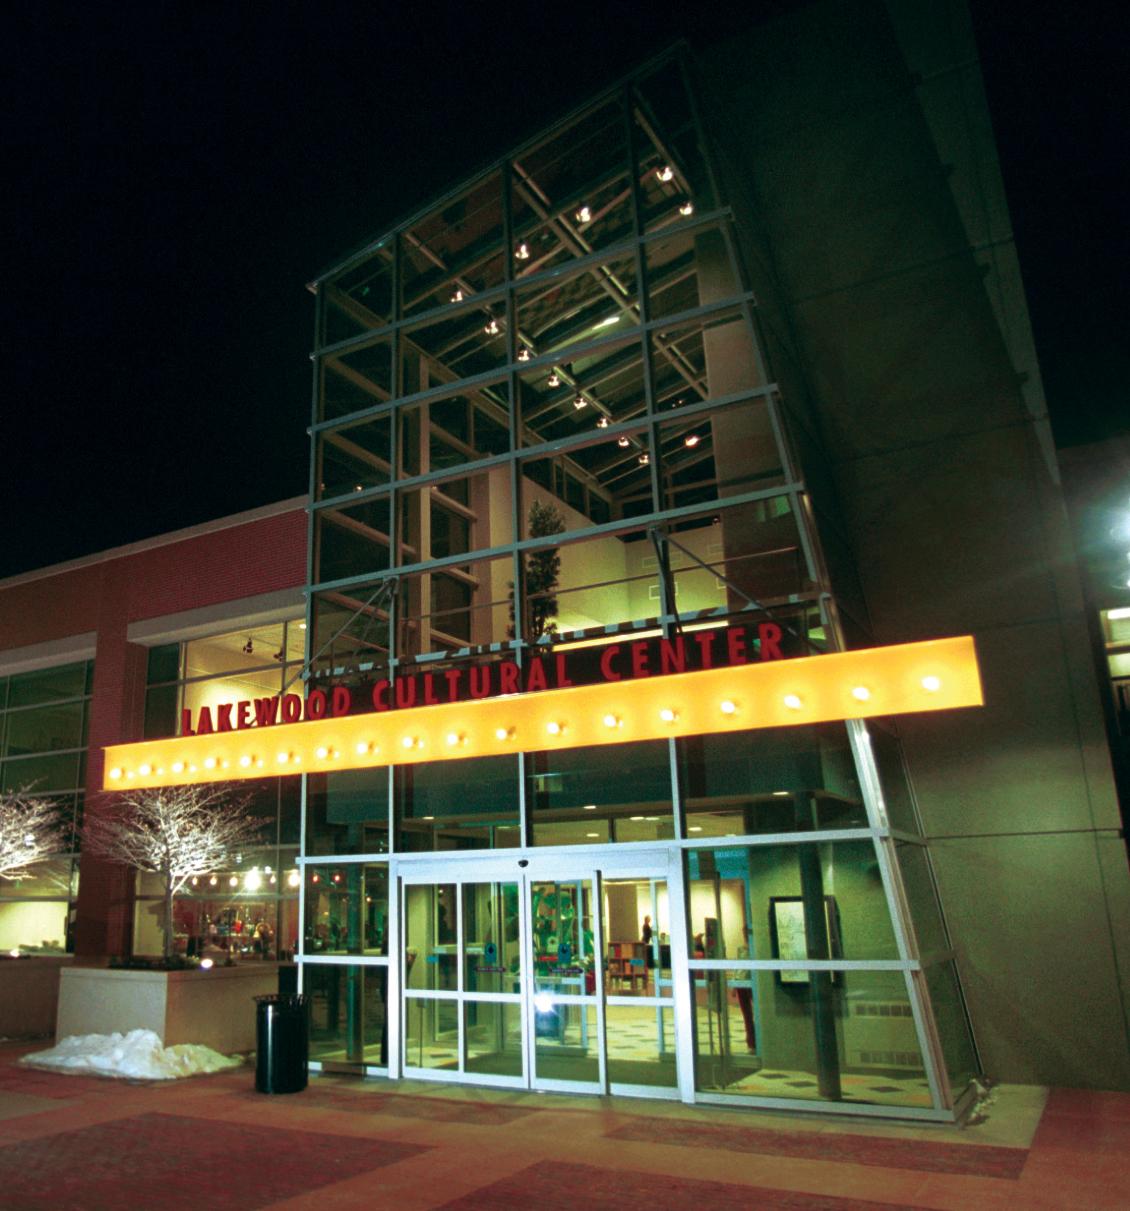 Lakewood cultural center